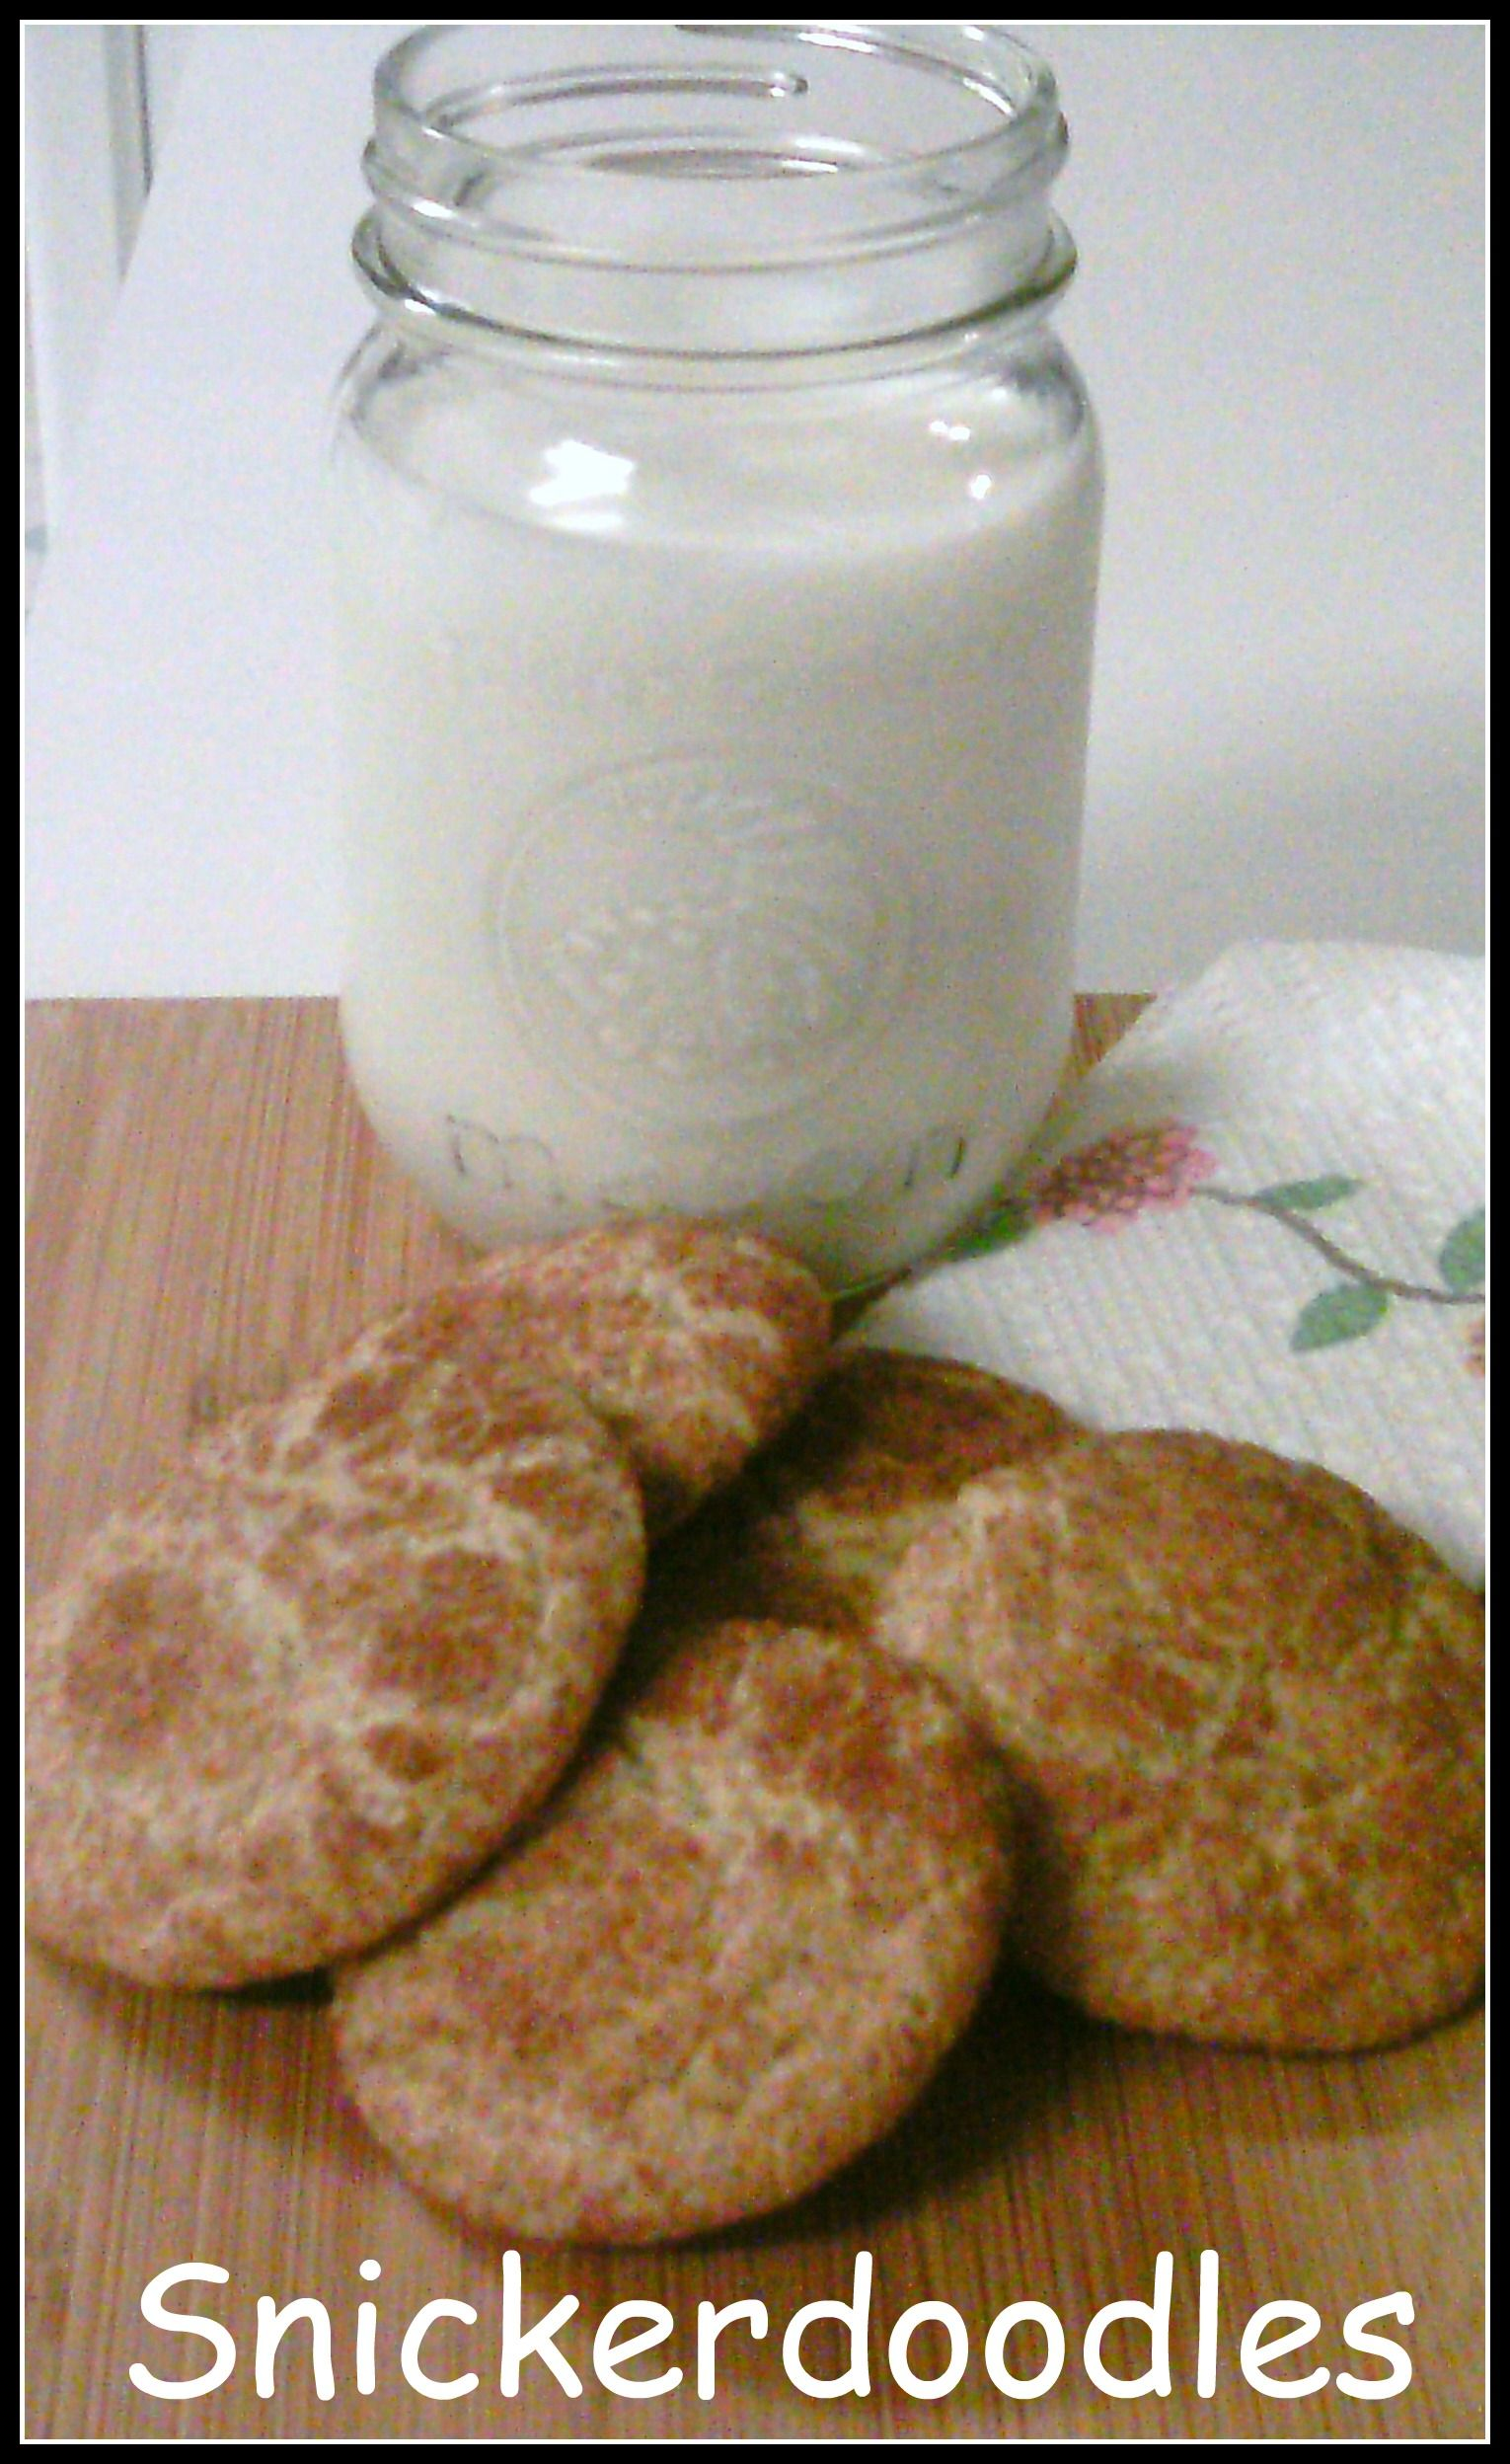 Snickerdoodles - Slightly crisp cinnamon-sugared exterior with a delicious chewy interior.